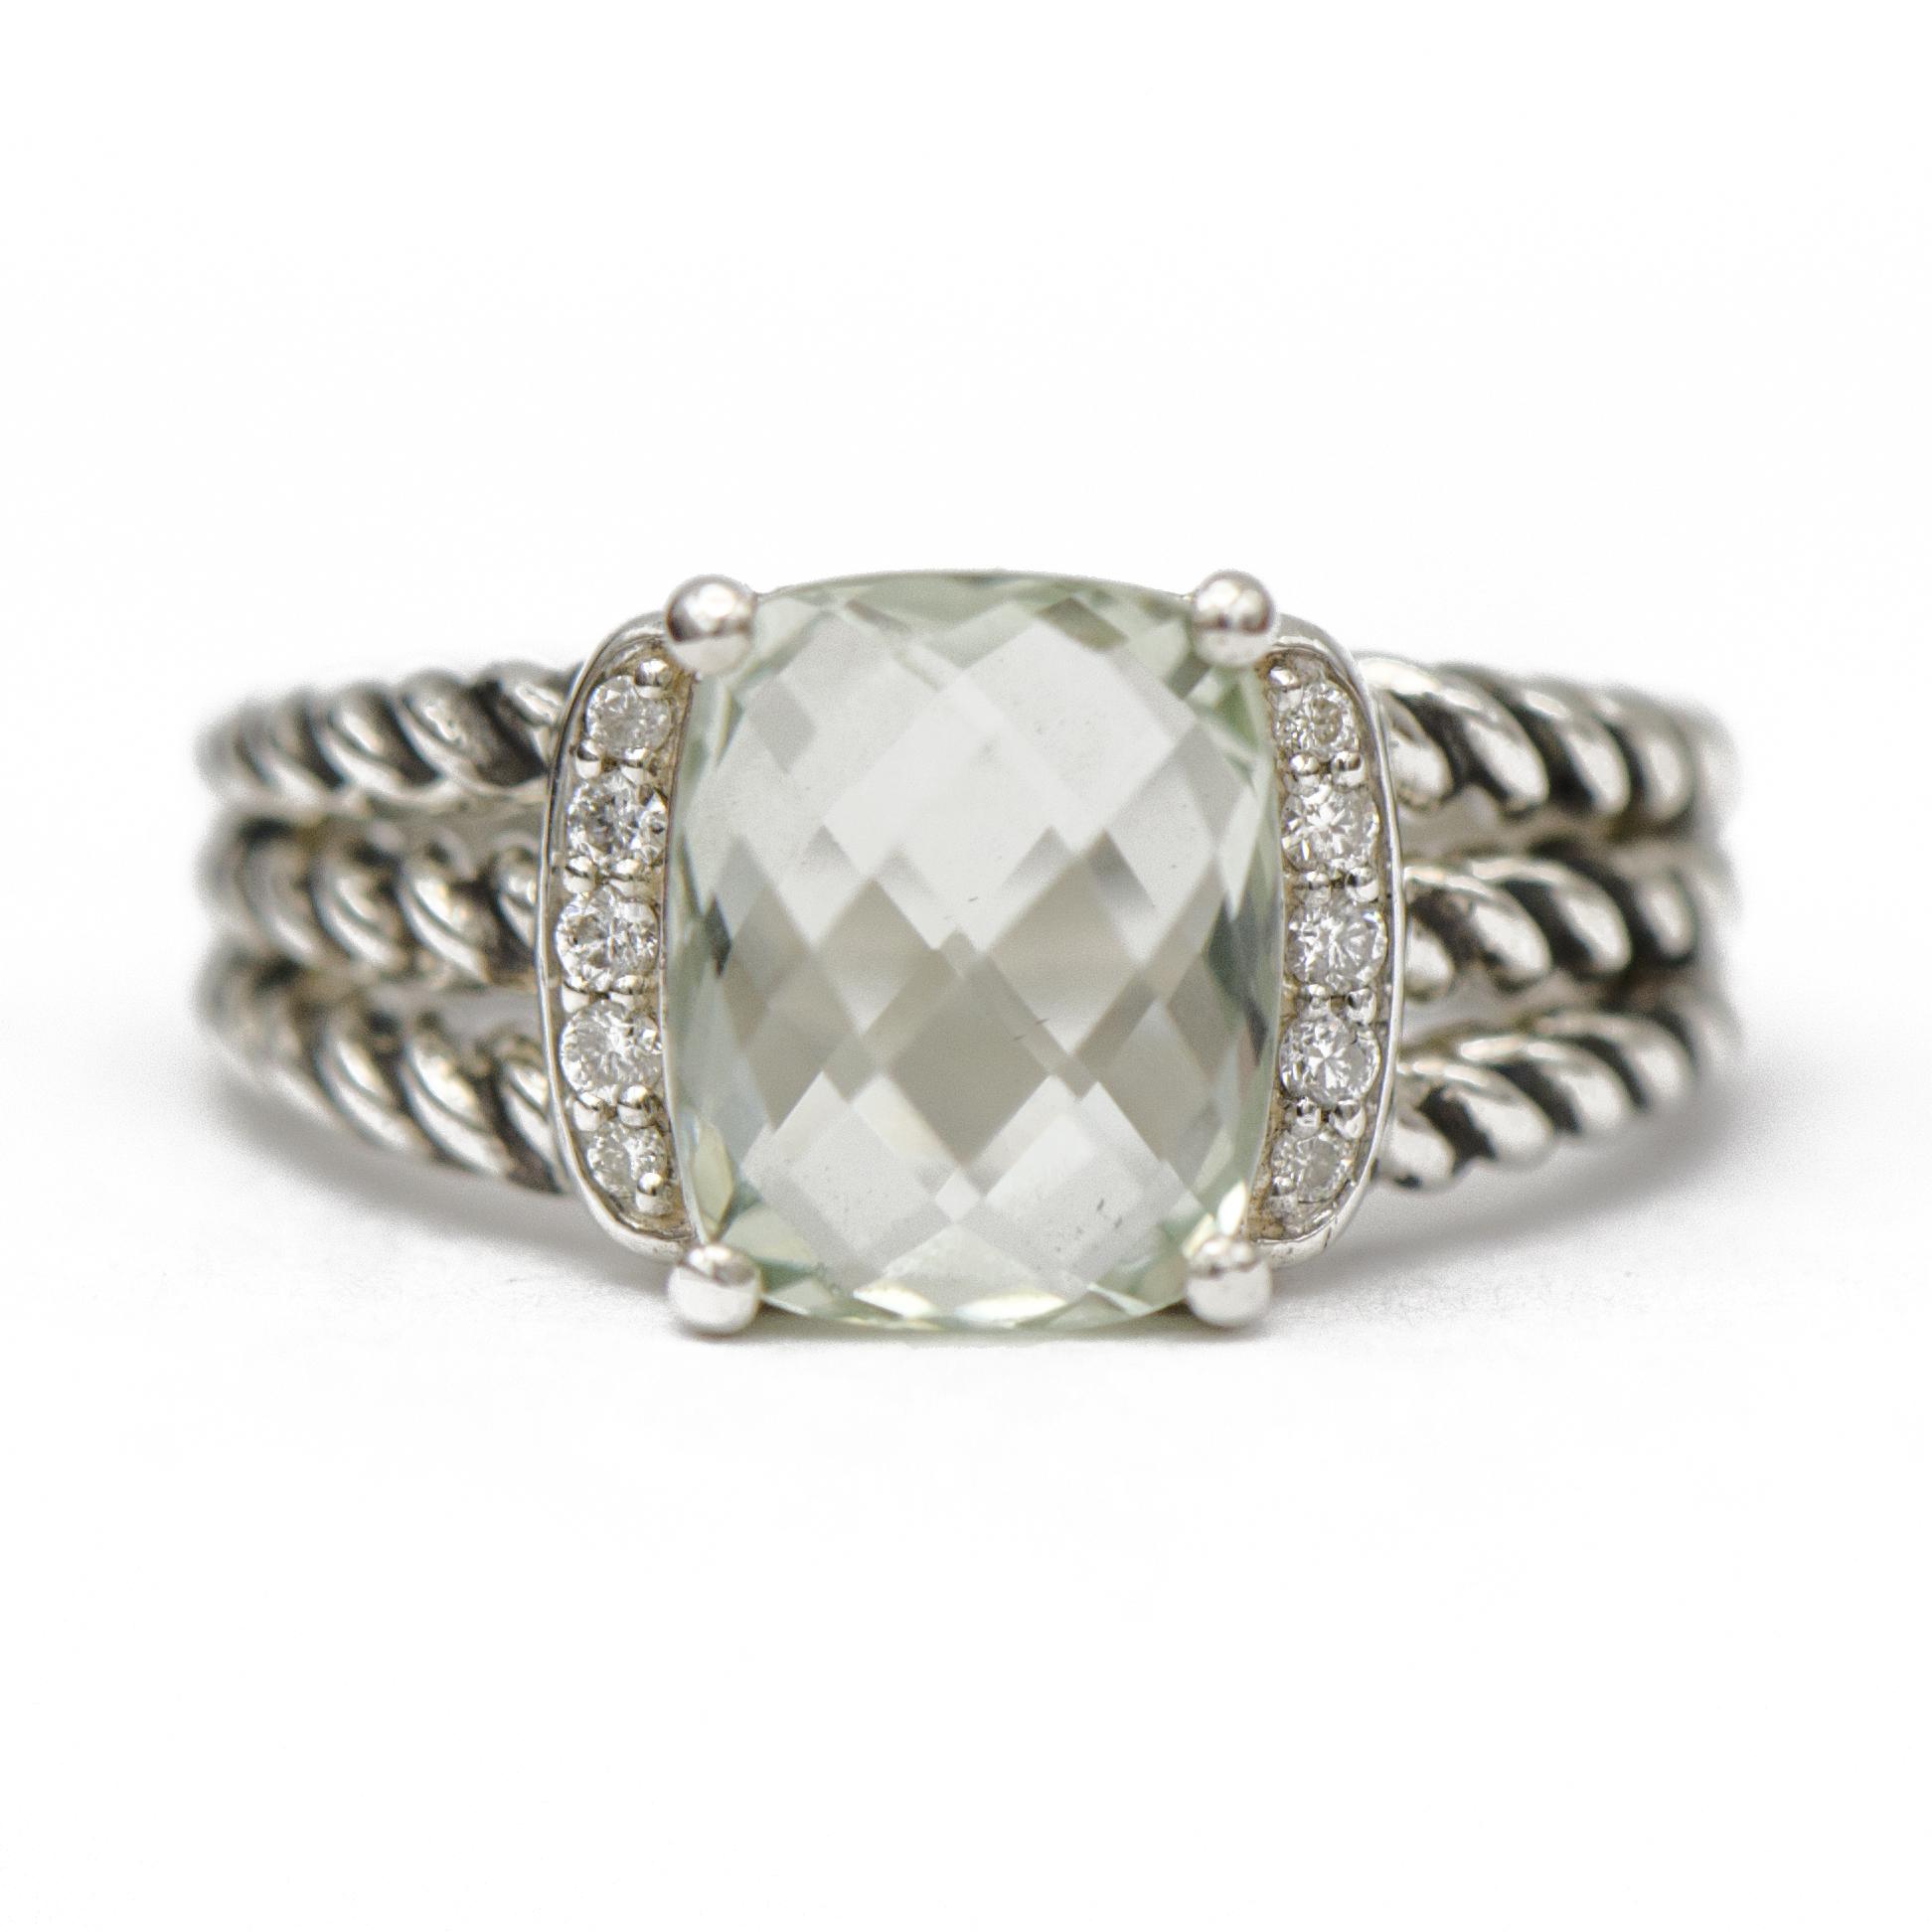 David Yurman Prasiolite Petite Wheaton Ring Sandler S Diamonds Time Columbia Sc Mt Pleasant